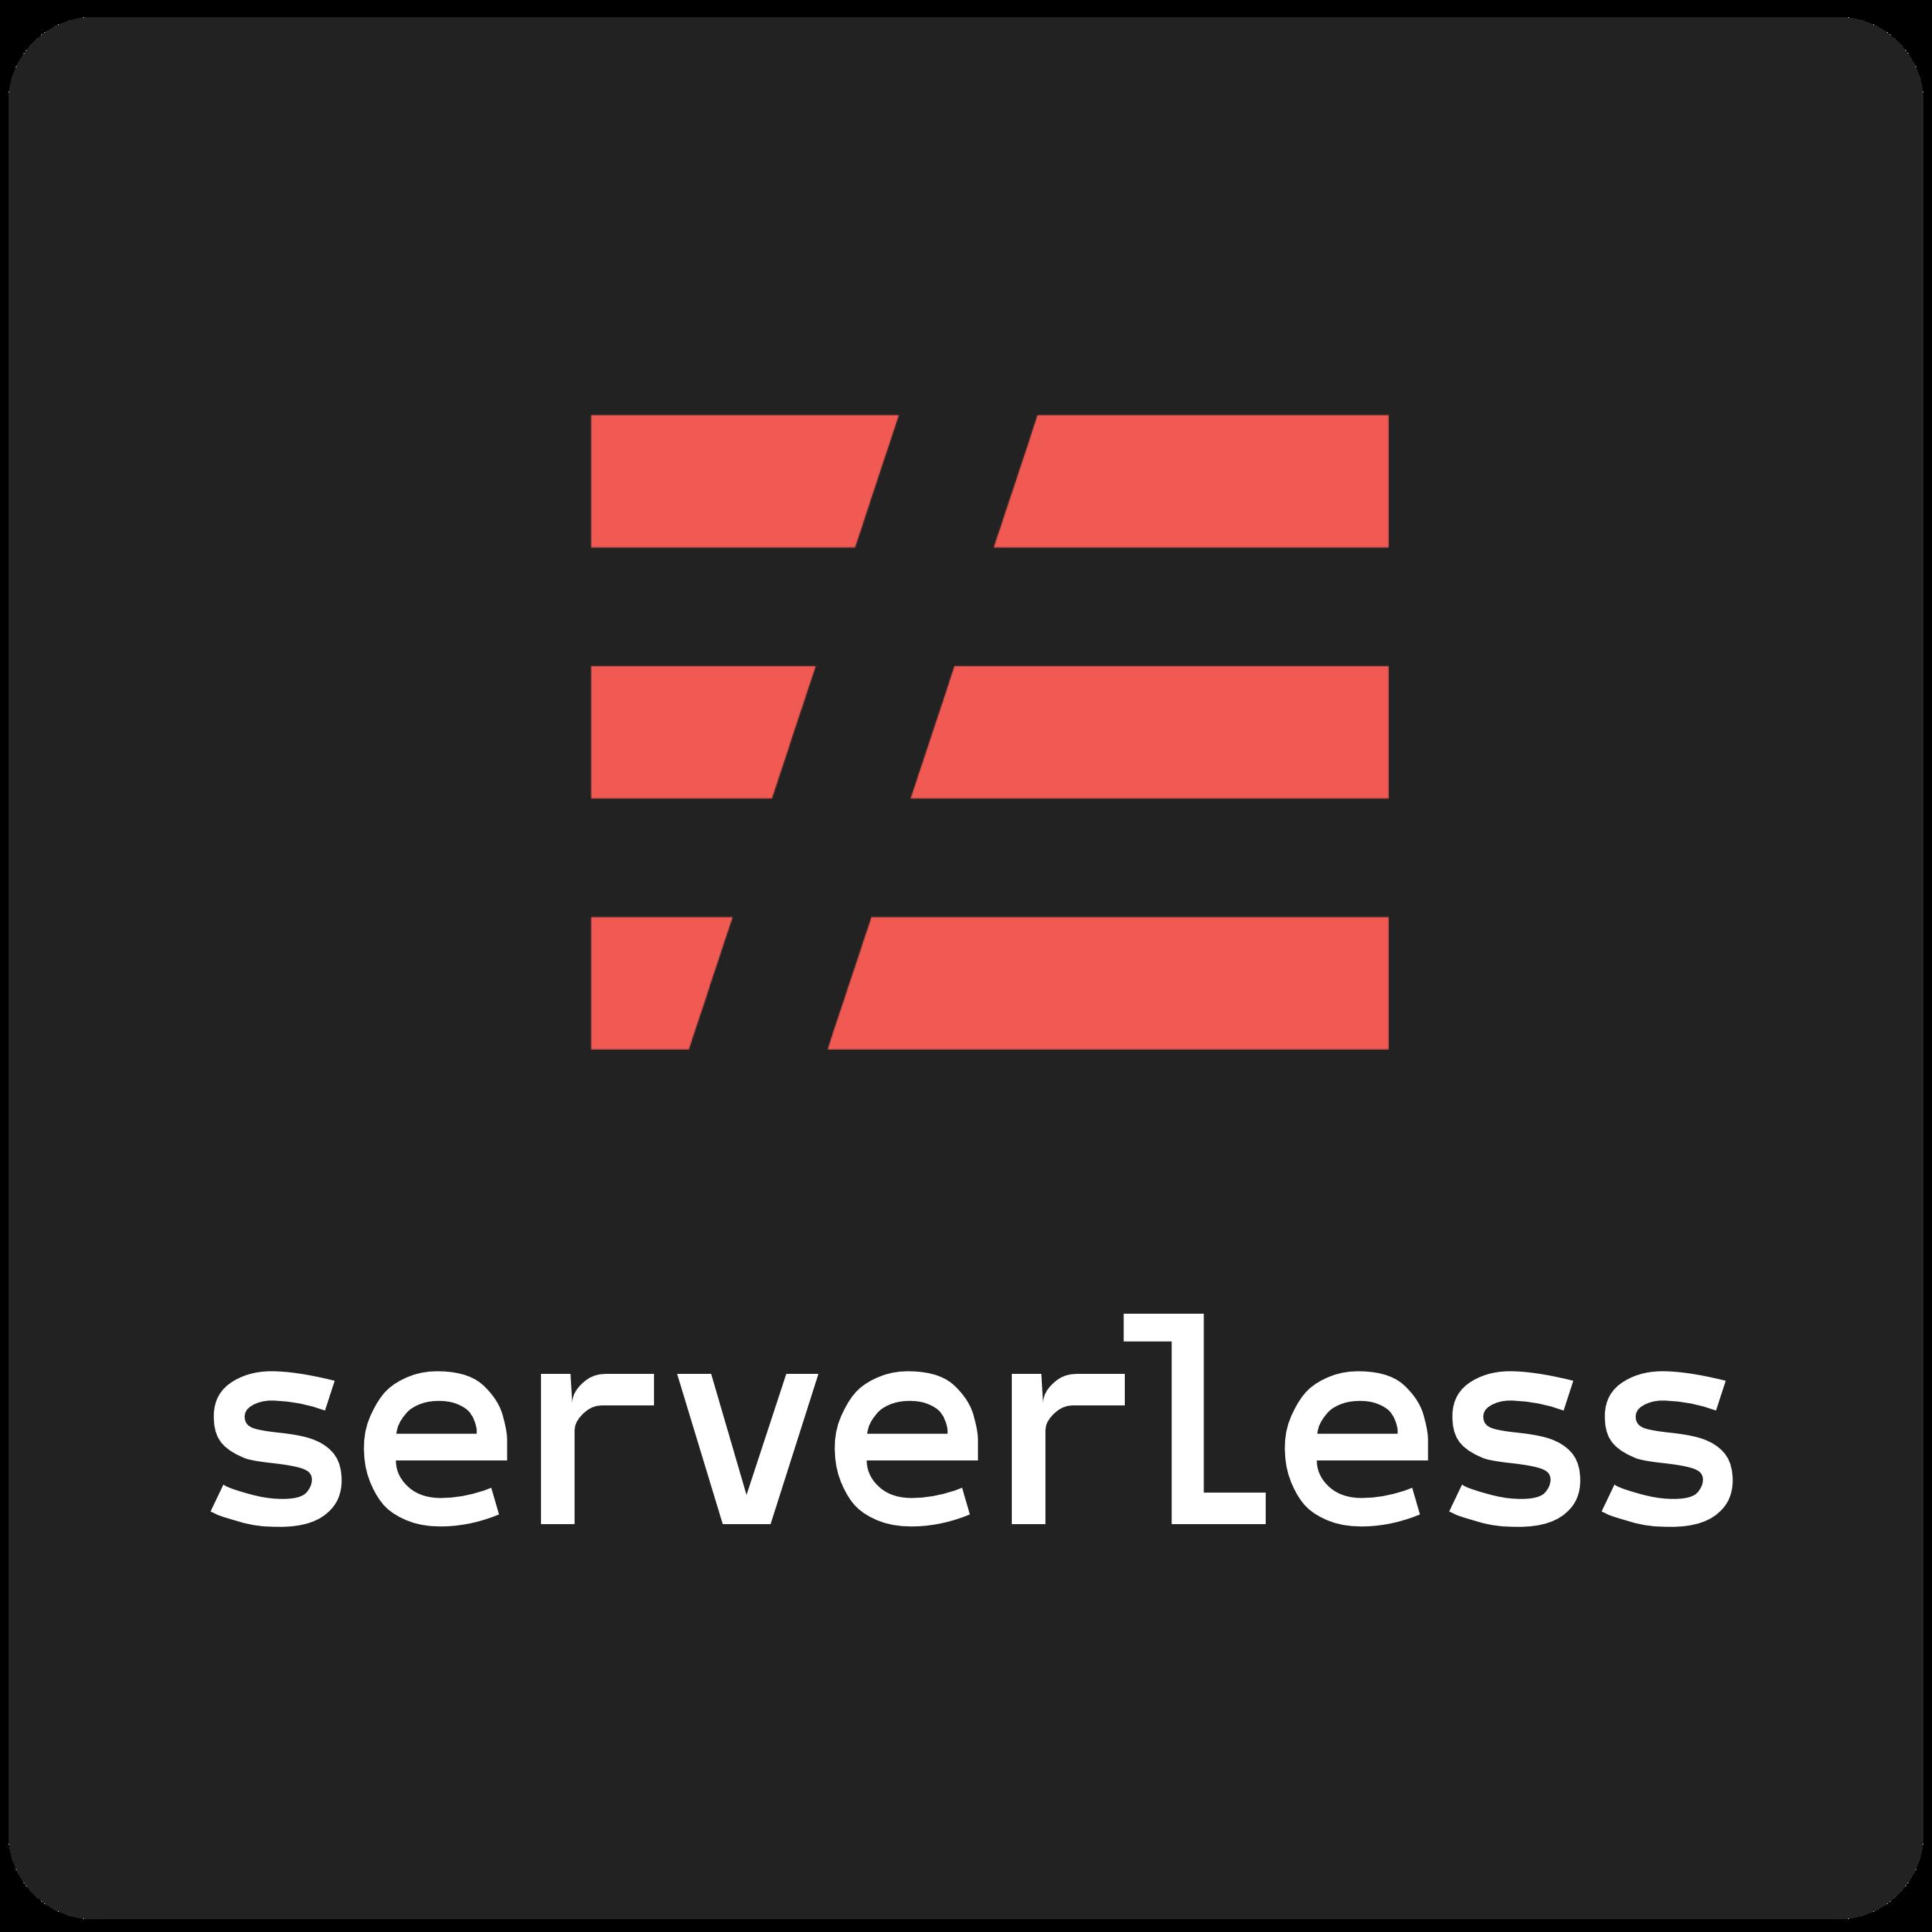 update the serverless framework logo 183 issue 175 183 cncf